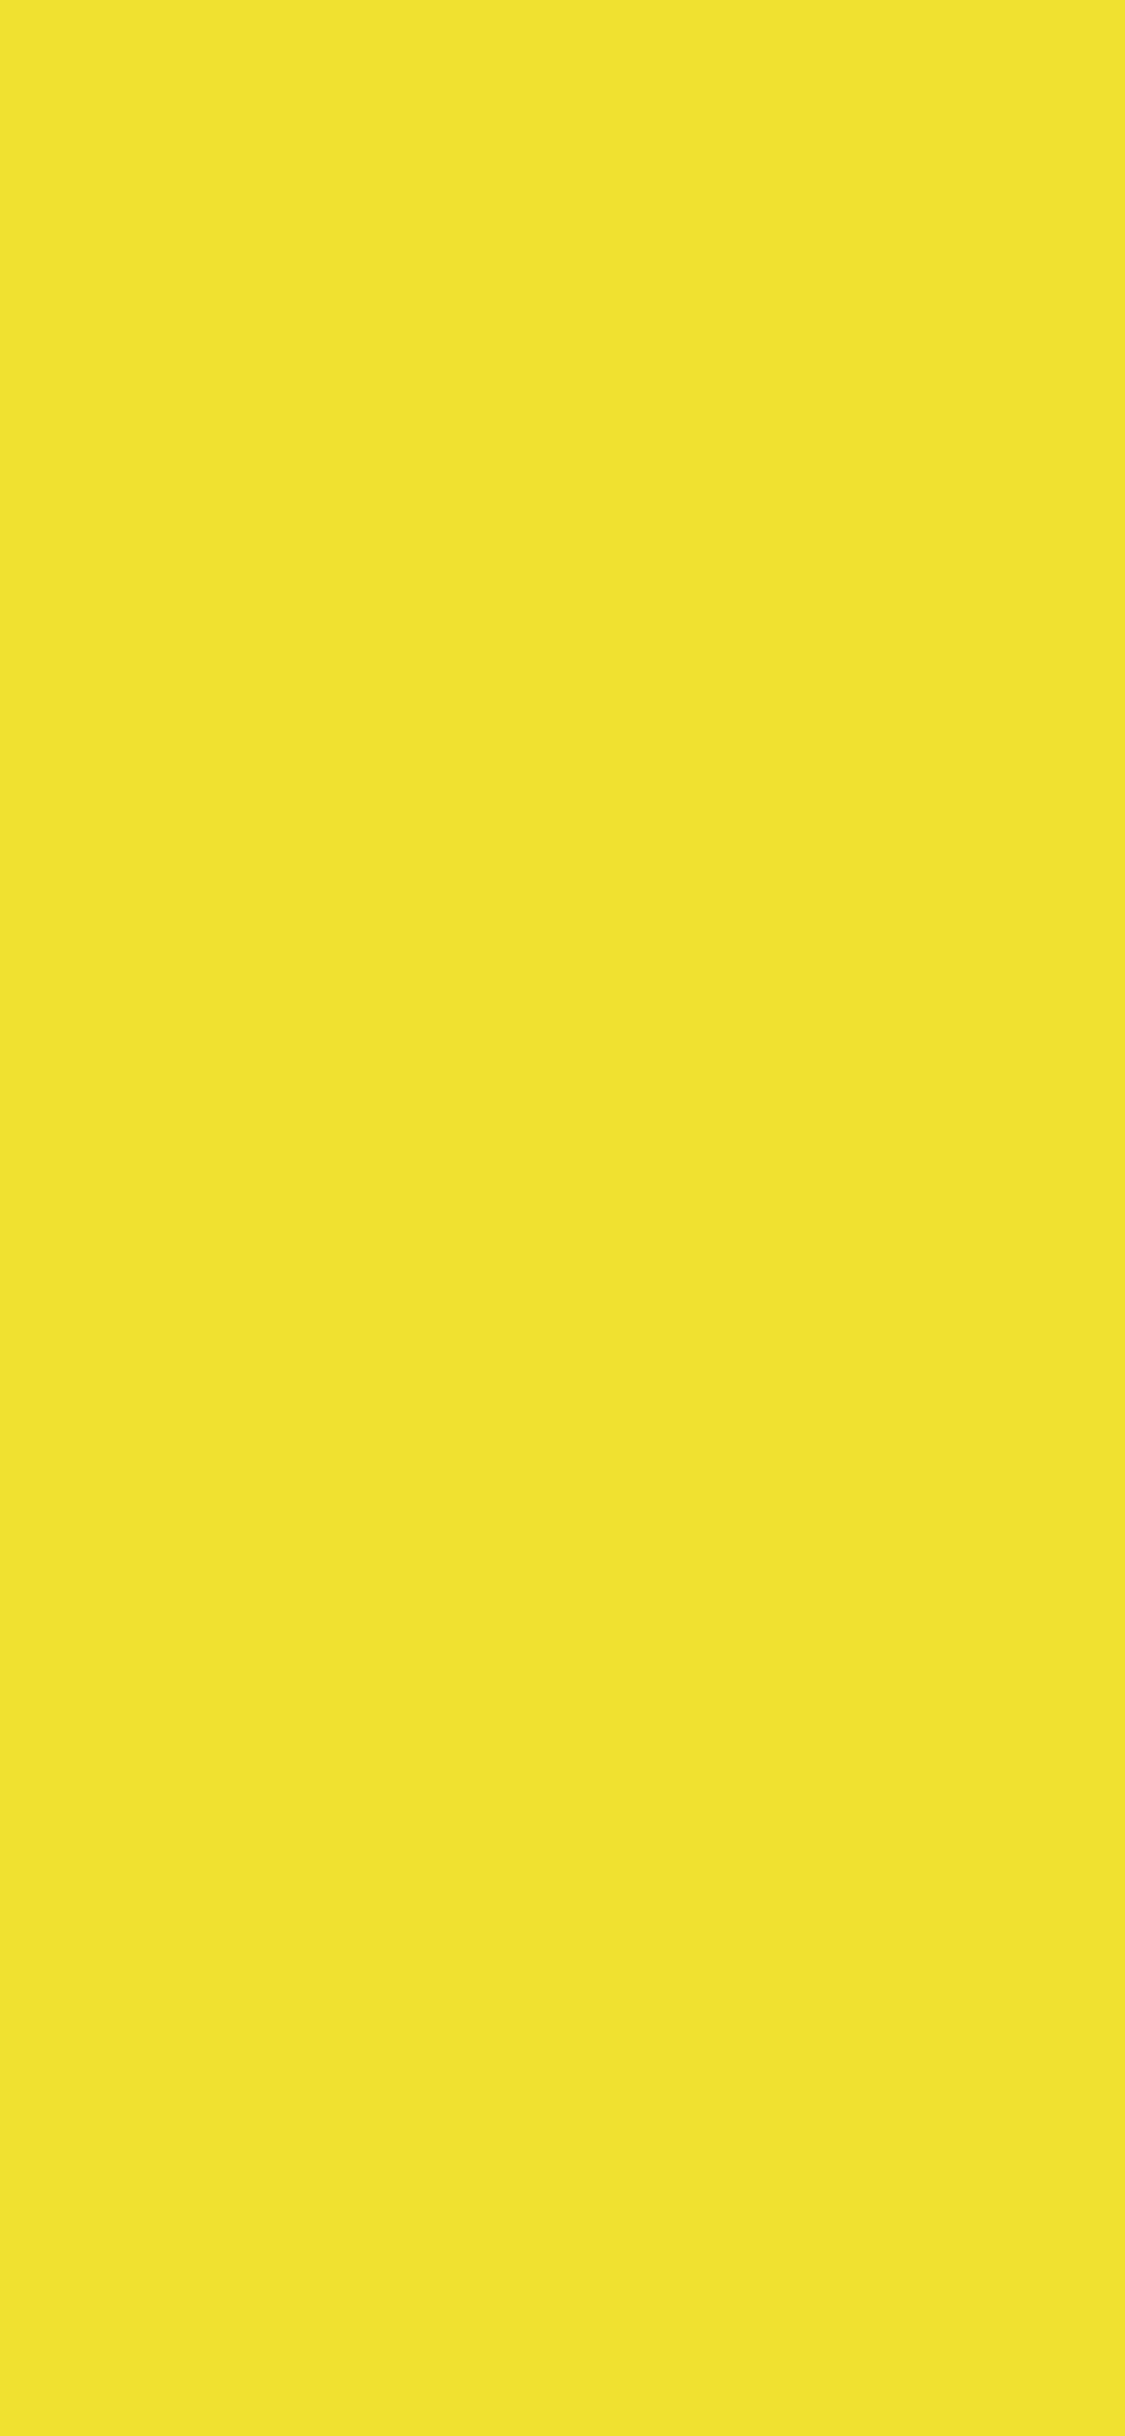 1125x2436 Dandelion Solid Color Background